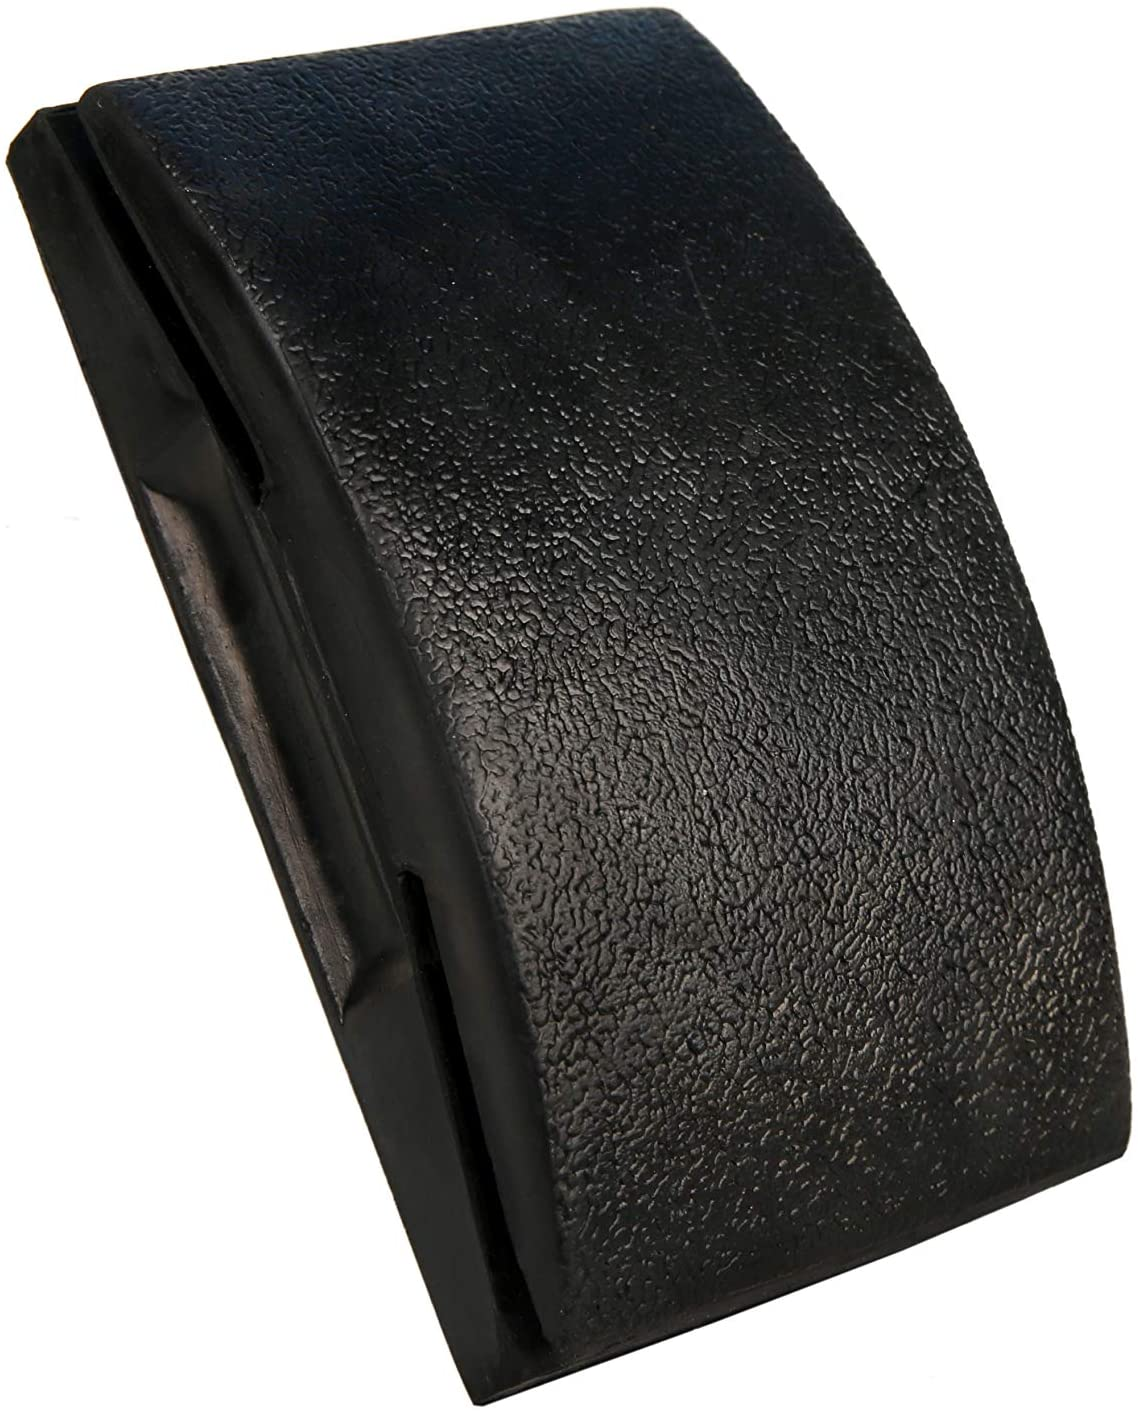 CHEN REFINISH Premium Quality Black 2-3/4